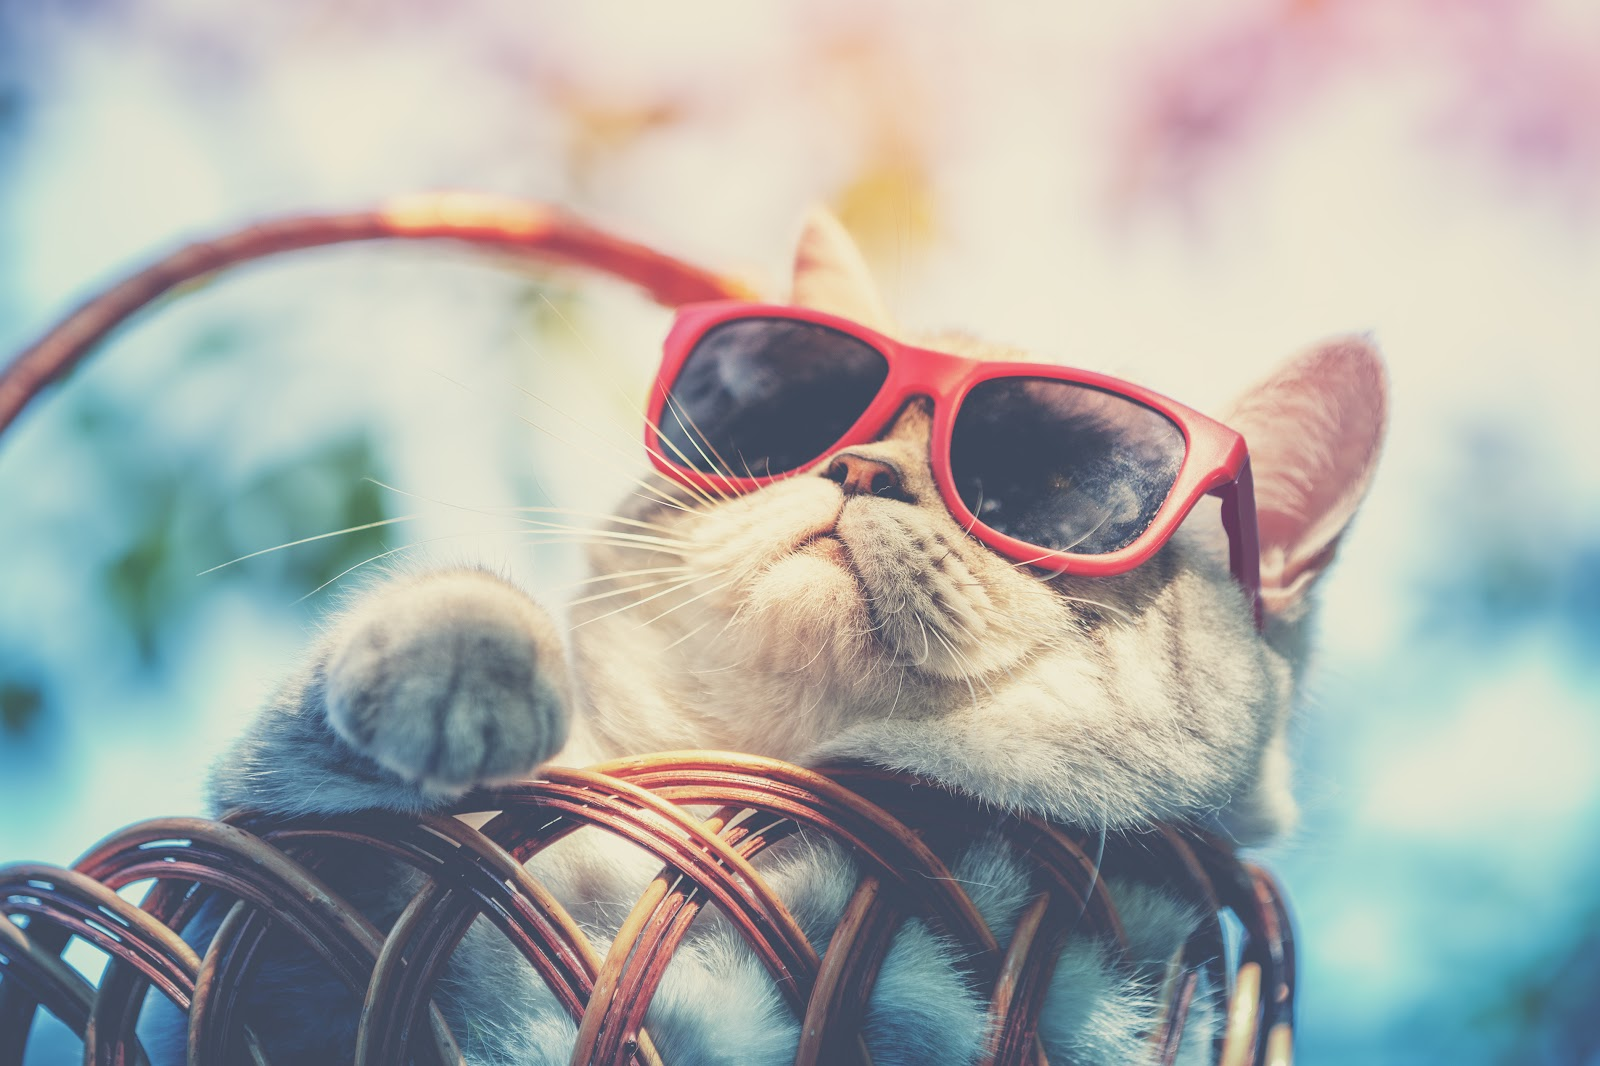 cool cat wearing sun glasses lying in a basket